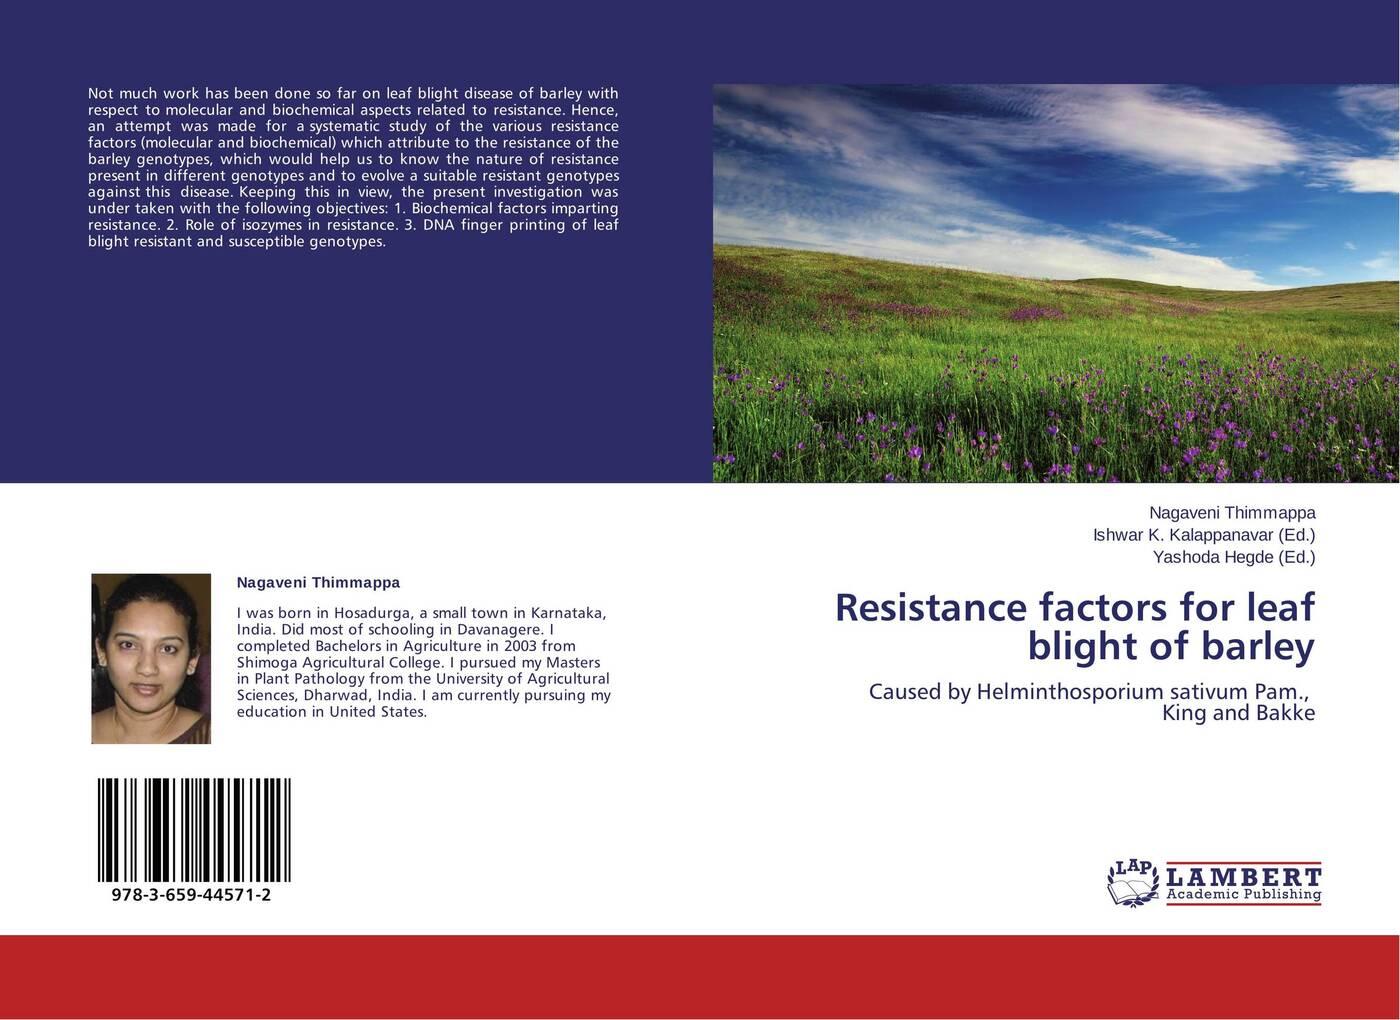 Nagaveni Thimmappa,Ishwar K. Kalappanavar and Yashoda Hegde Resistance factors for leaf blight of barley недорго, оригинальная цена